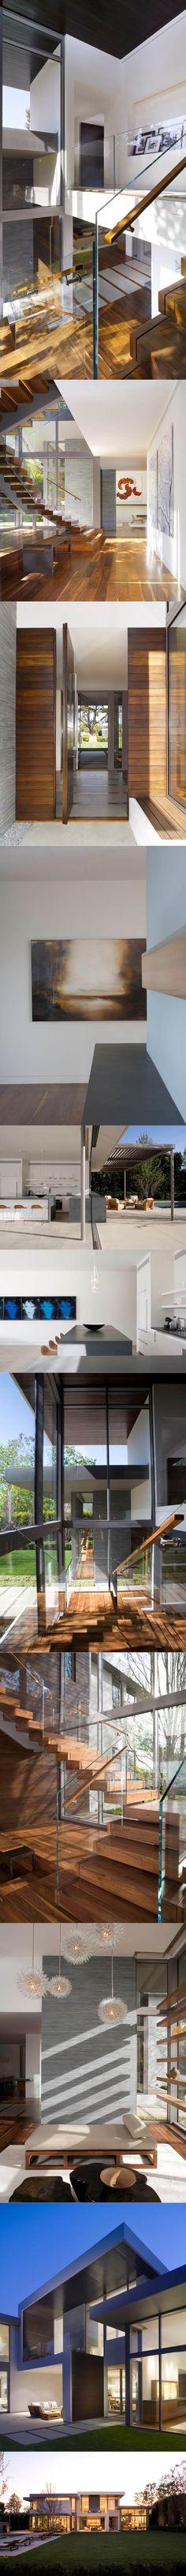 2011 Belzberg - Brentwood Residence / Los Angeles USA / wood stone / white grey